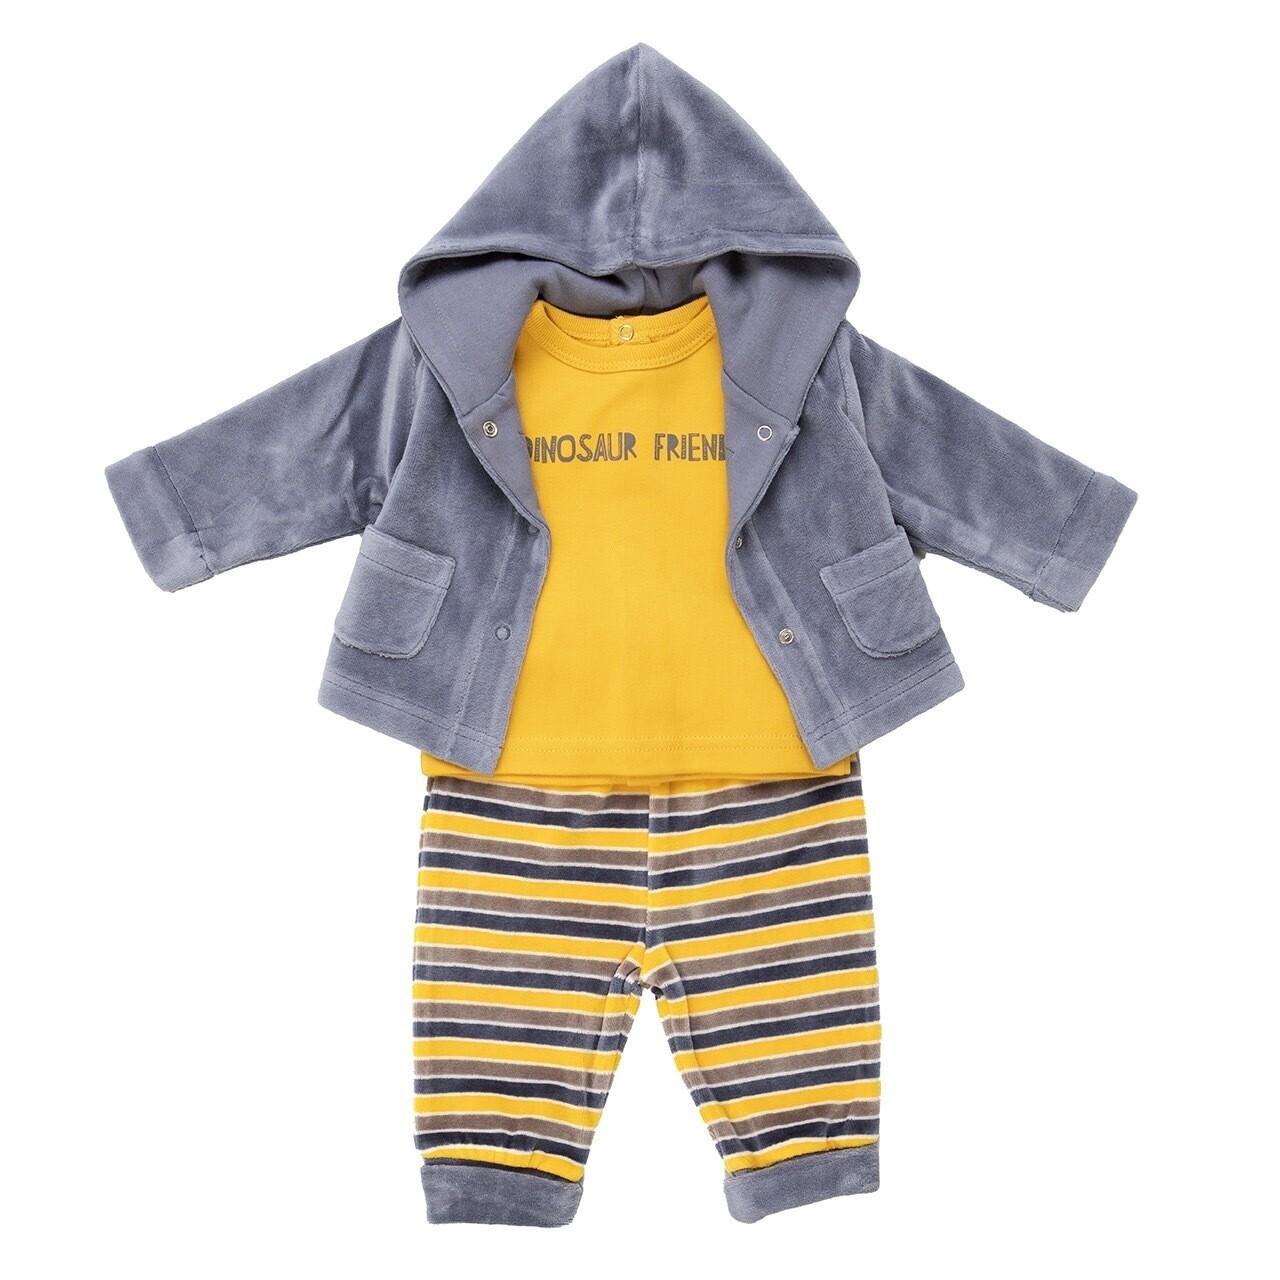 Babybol 3 Piece Boys Velour Outfit